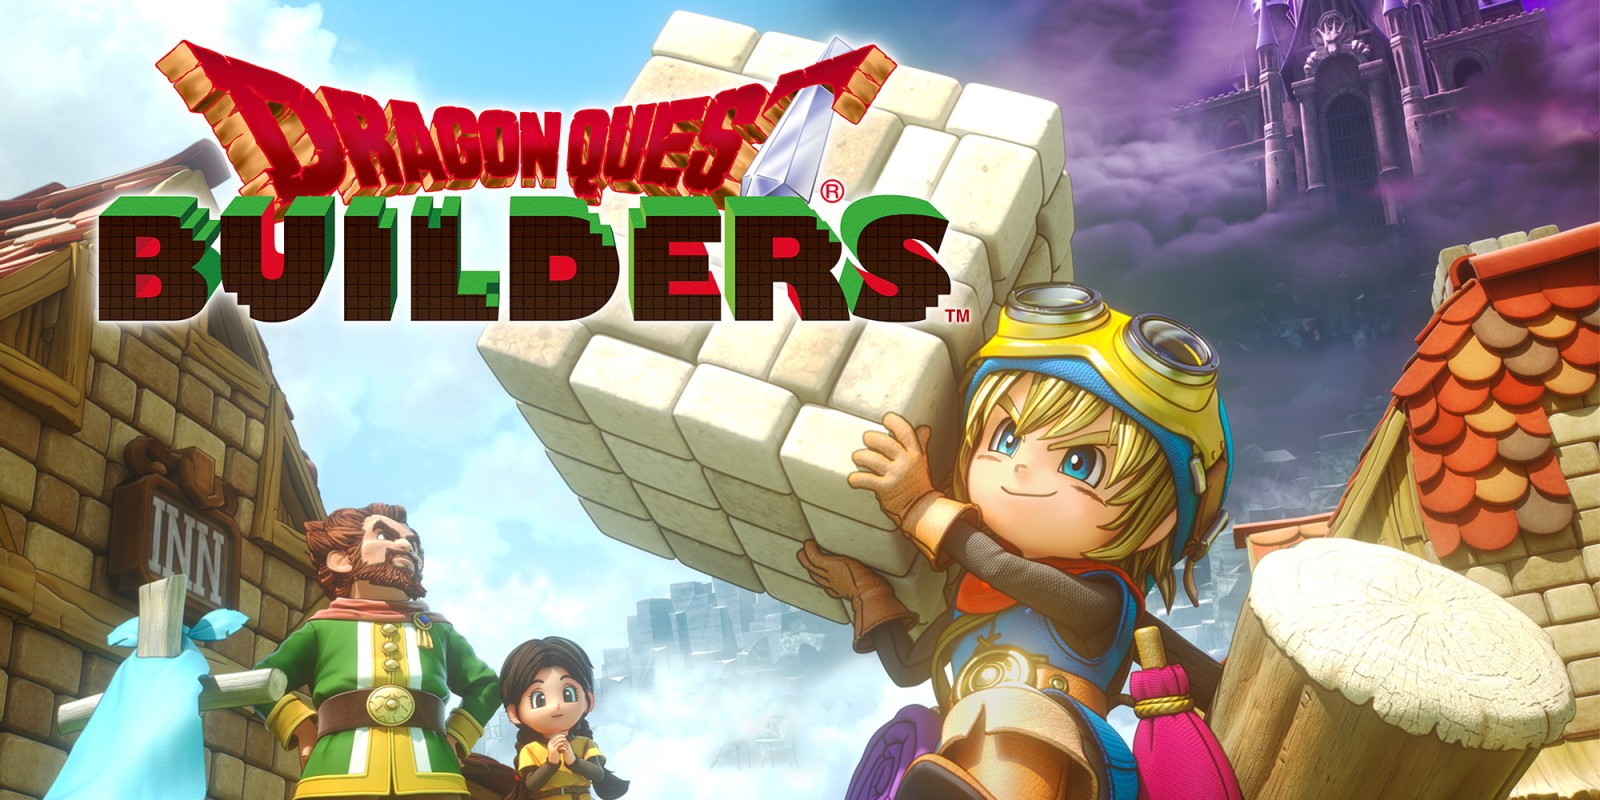 Dragon Quest Builders full